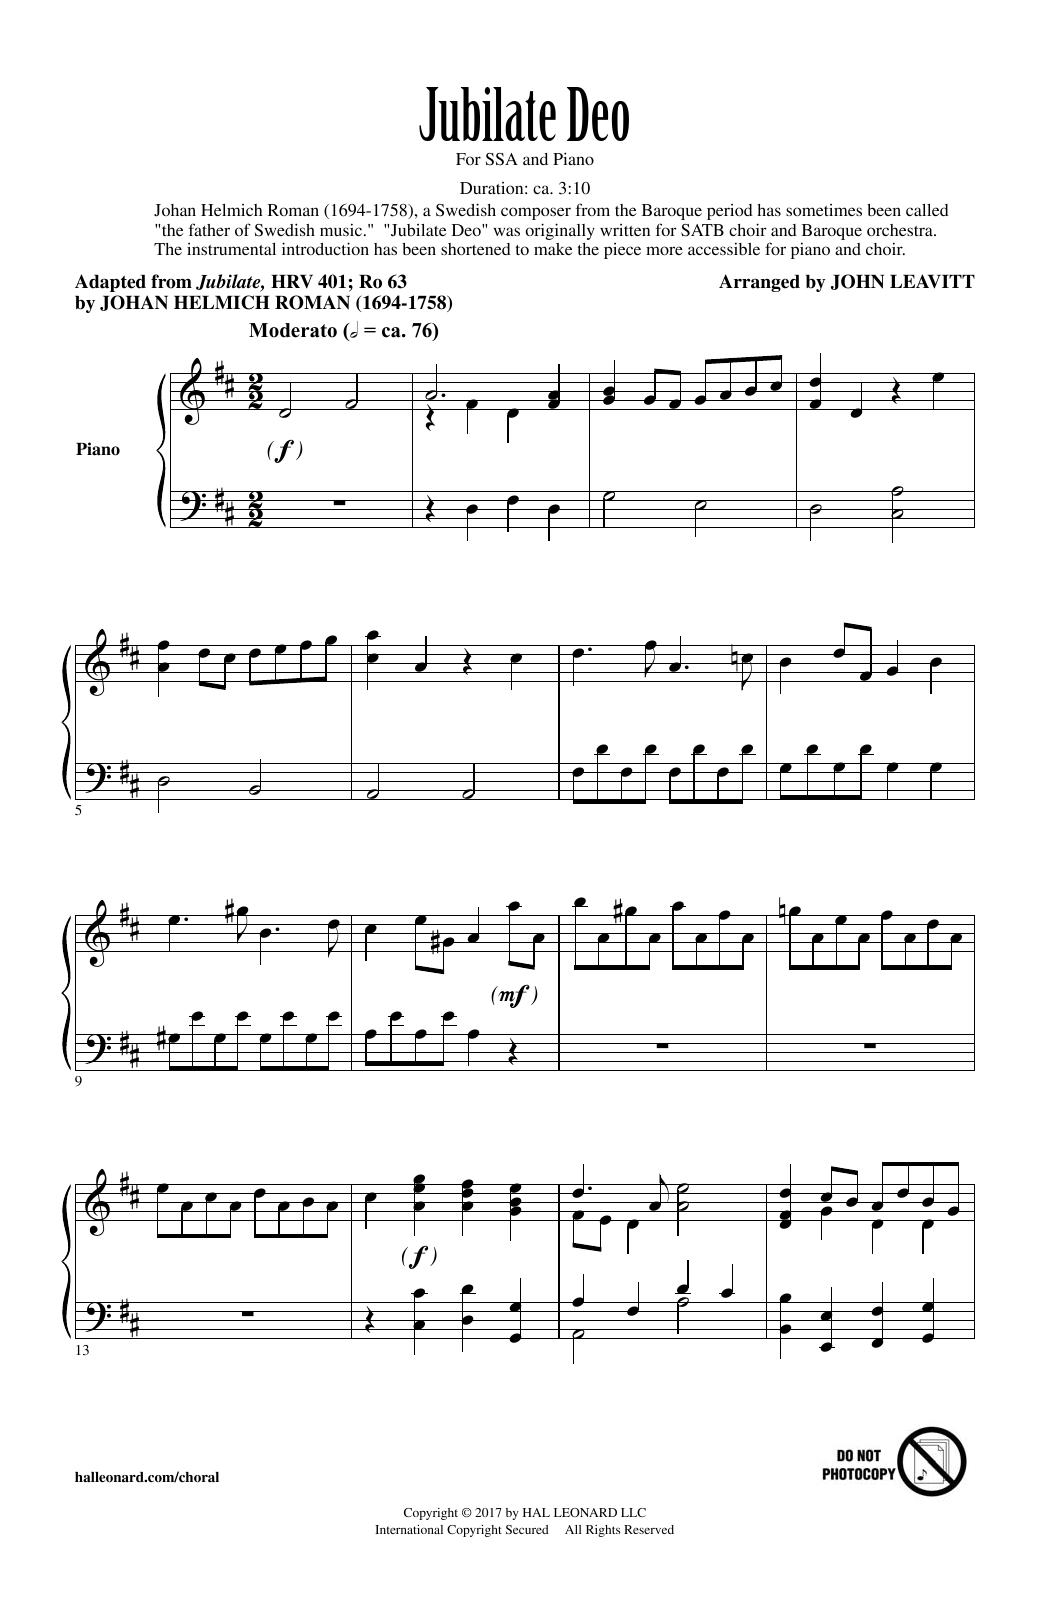 John Leavitt Jubilate Deo sheet music notes and chords. Download Printable PDF.